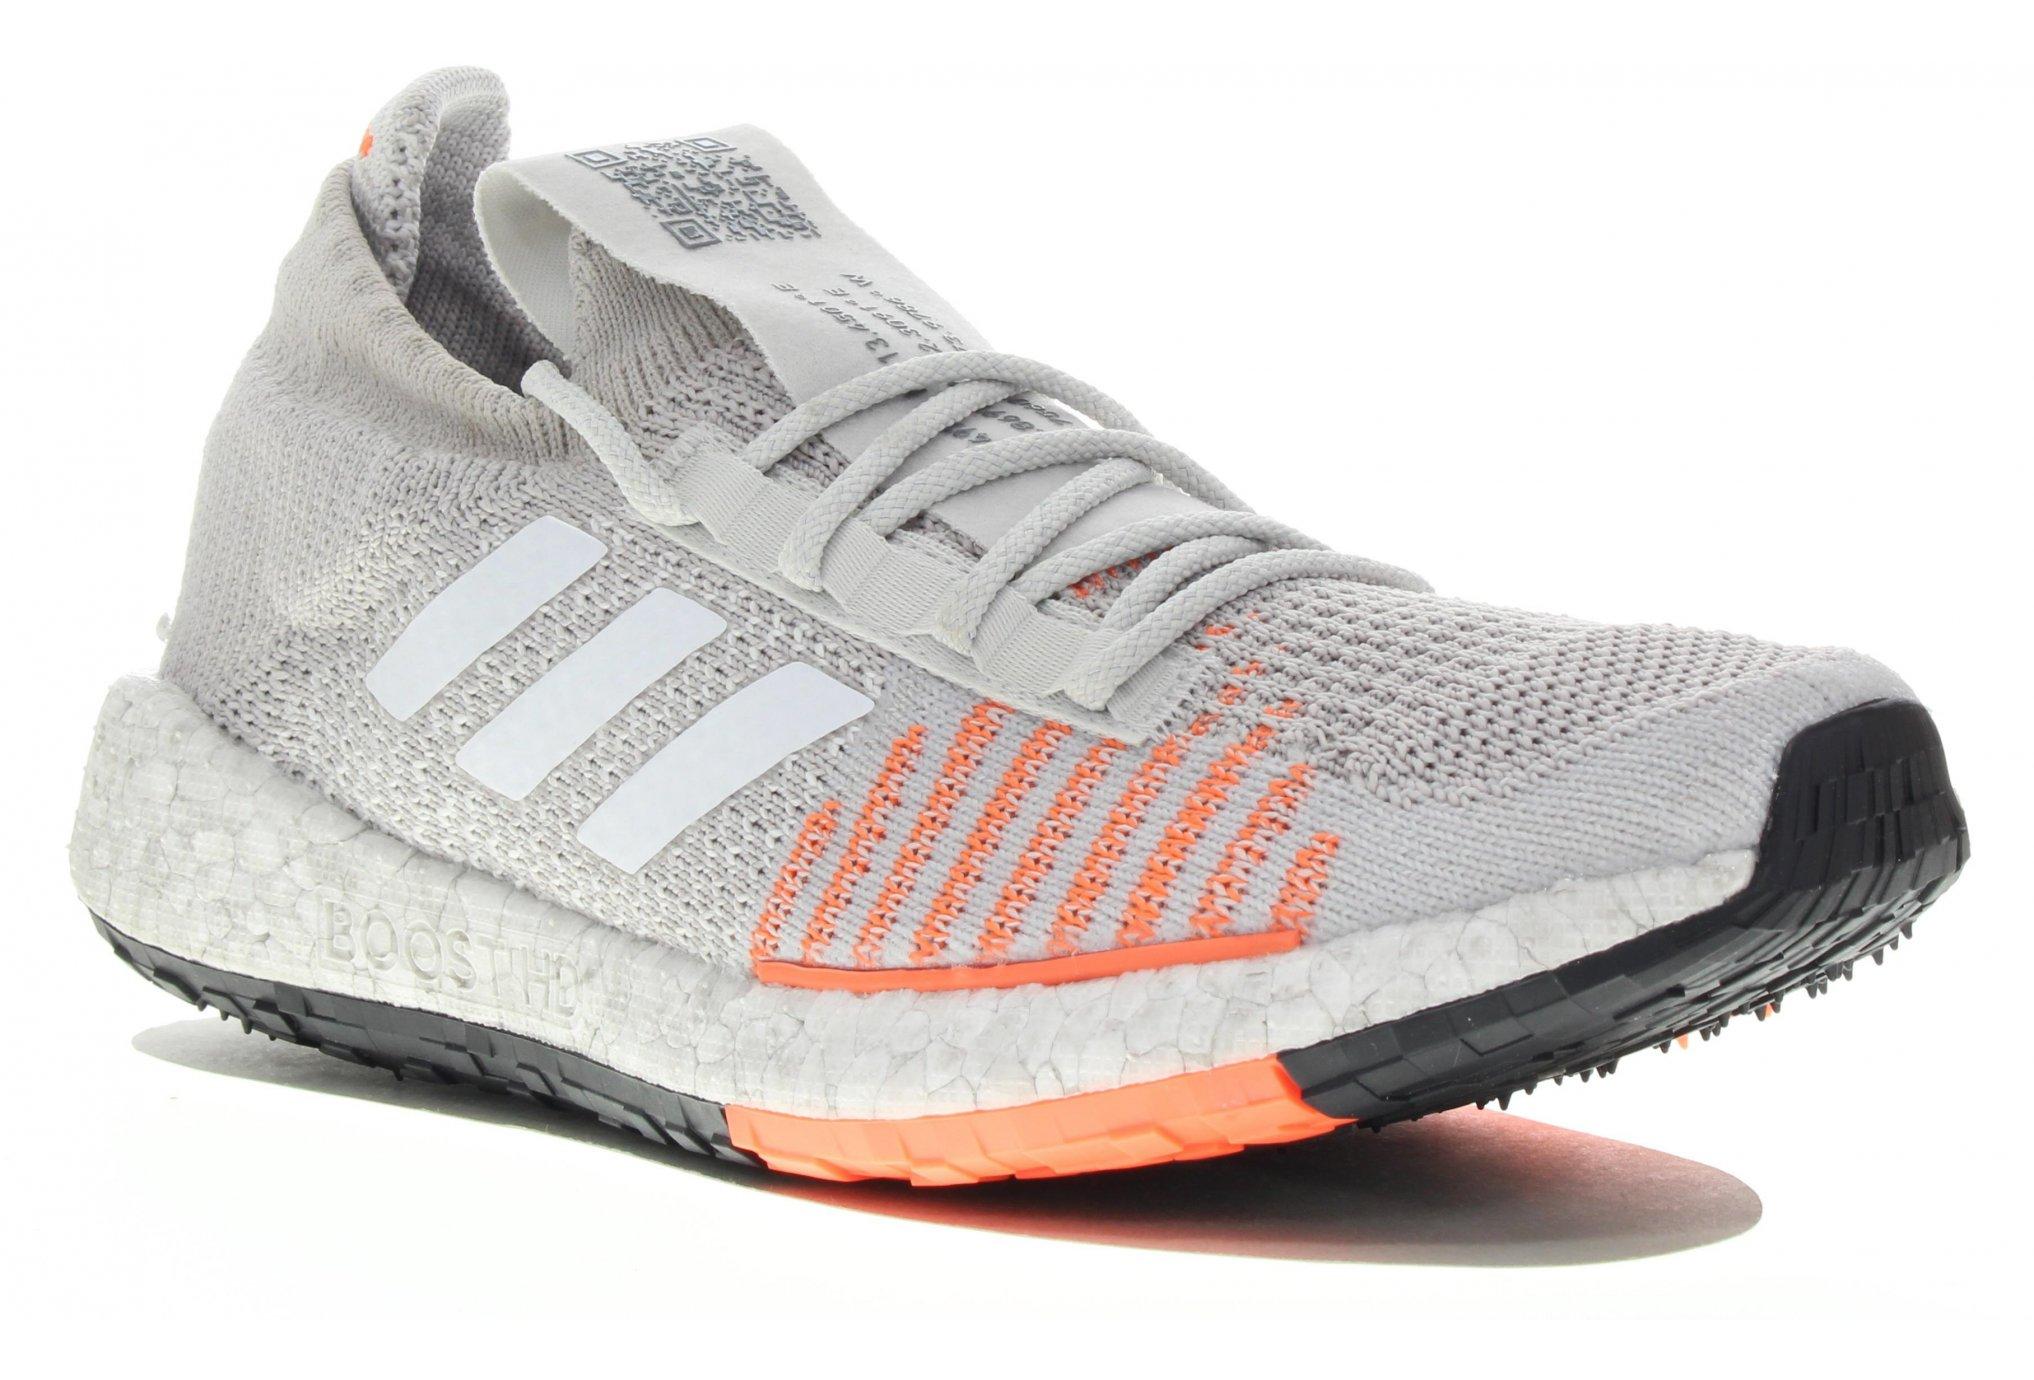 adidas Pulse Boost HD, la chaussure citadine qui tient